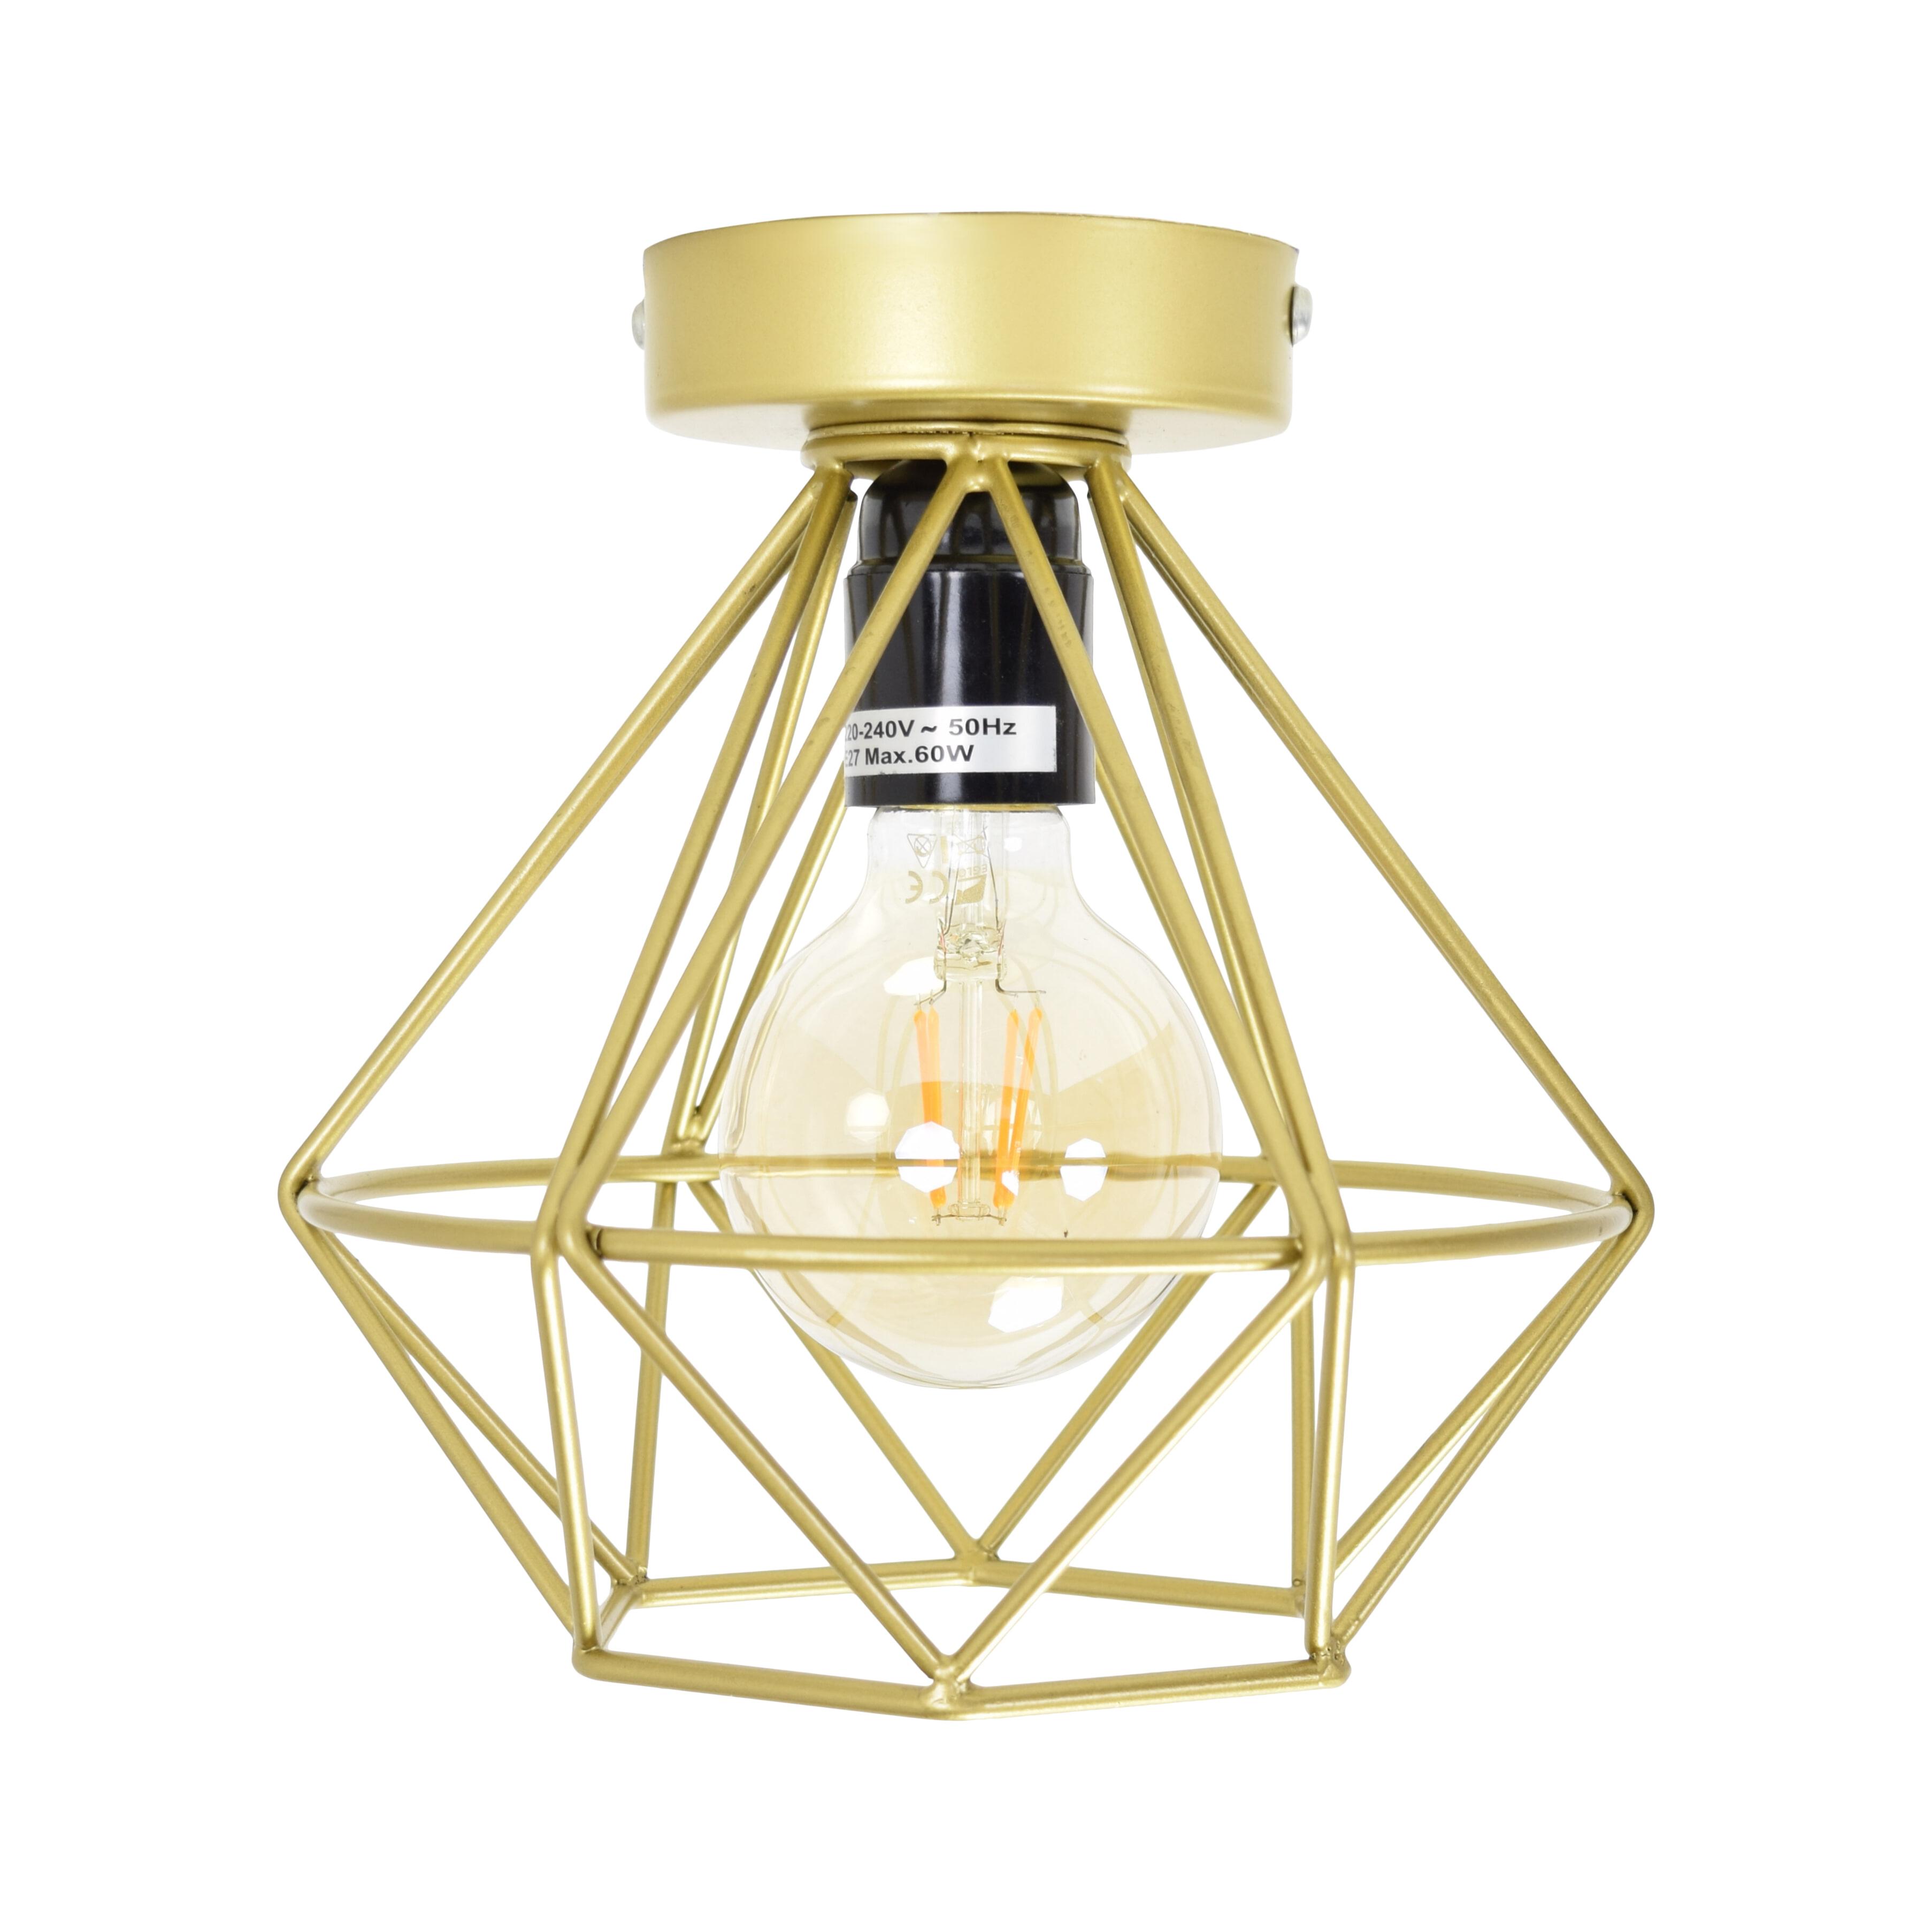 Urban Interiors plafondlamp 'Wire .' Ø22cm, kleur Goud